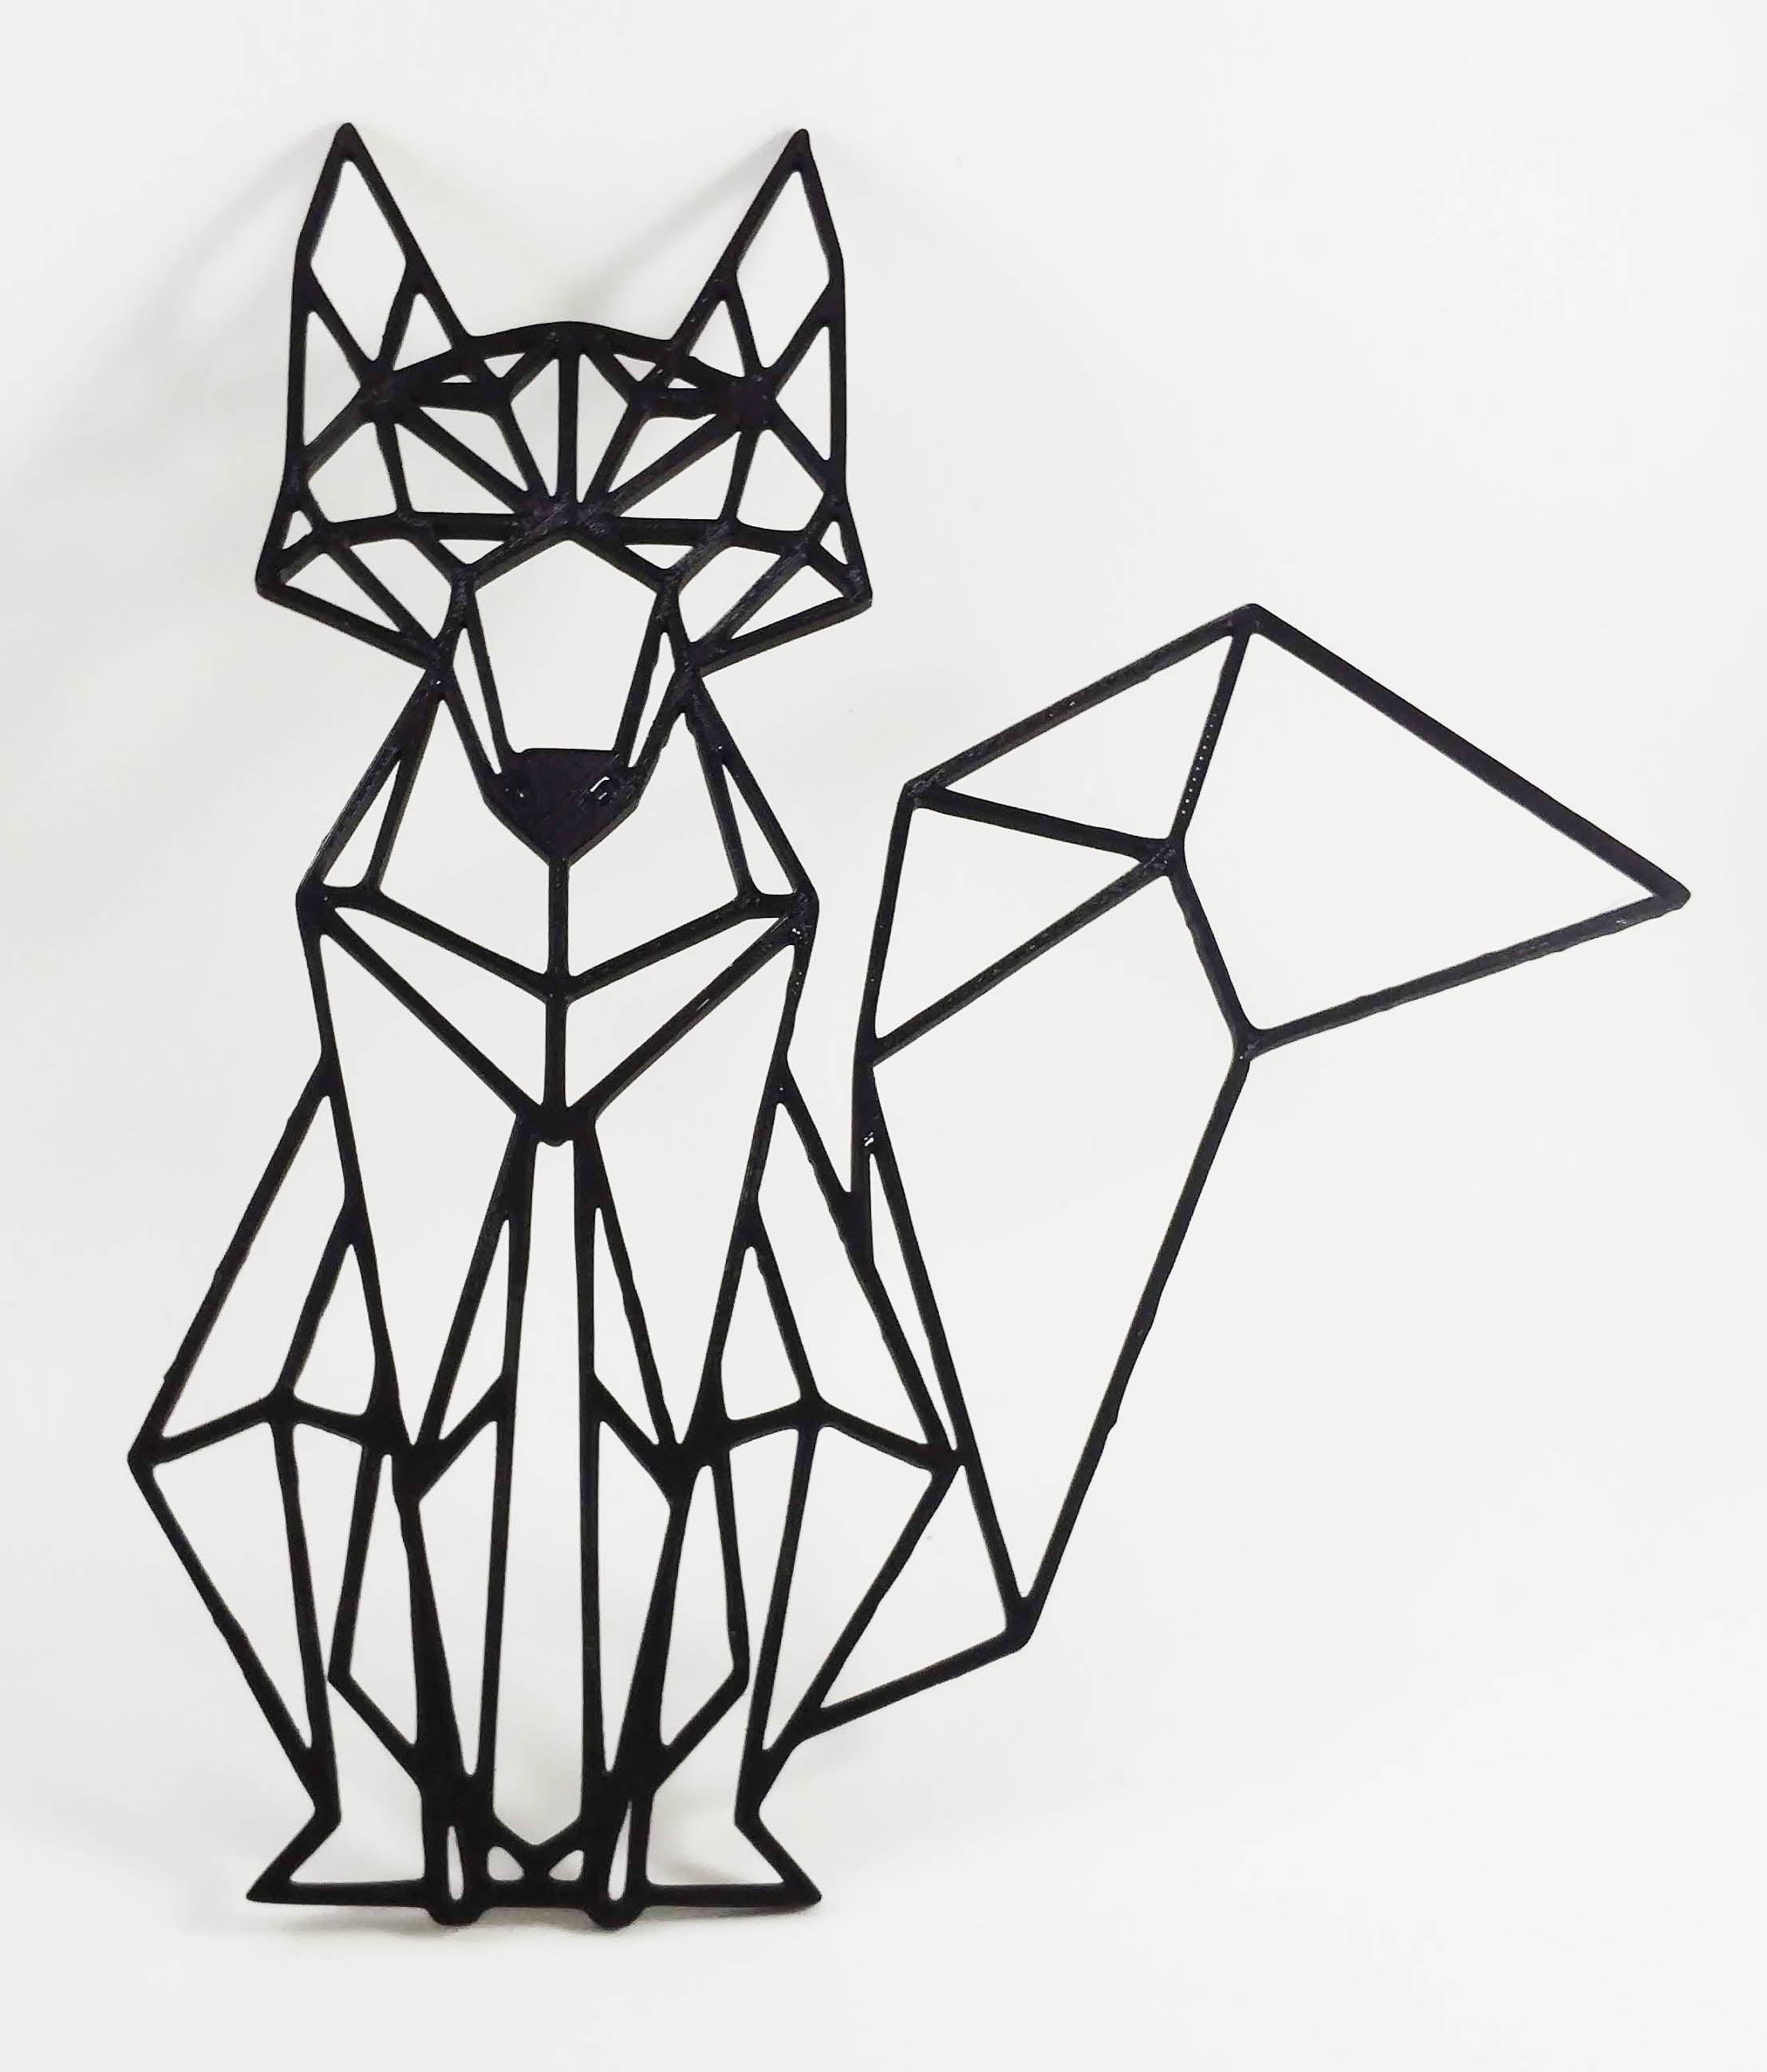 Raposa Geométrica